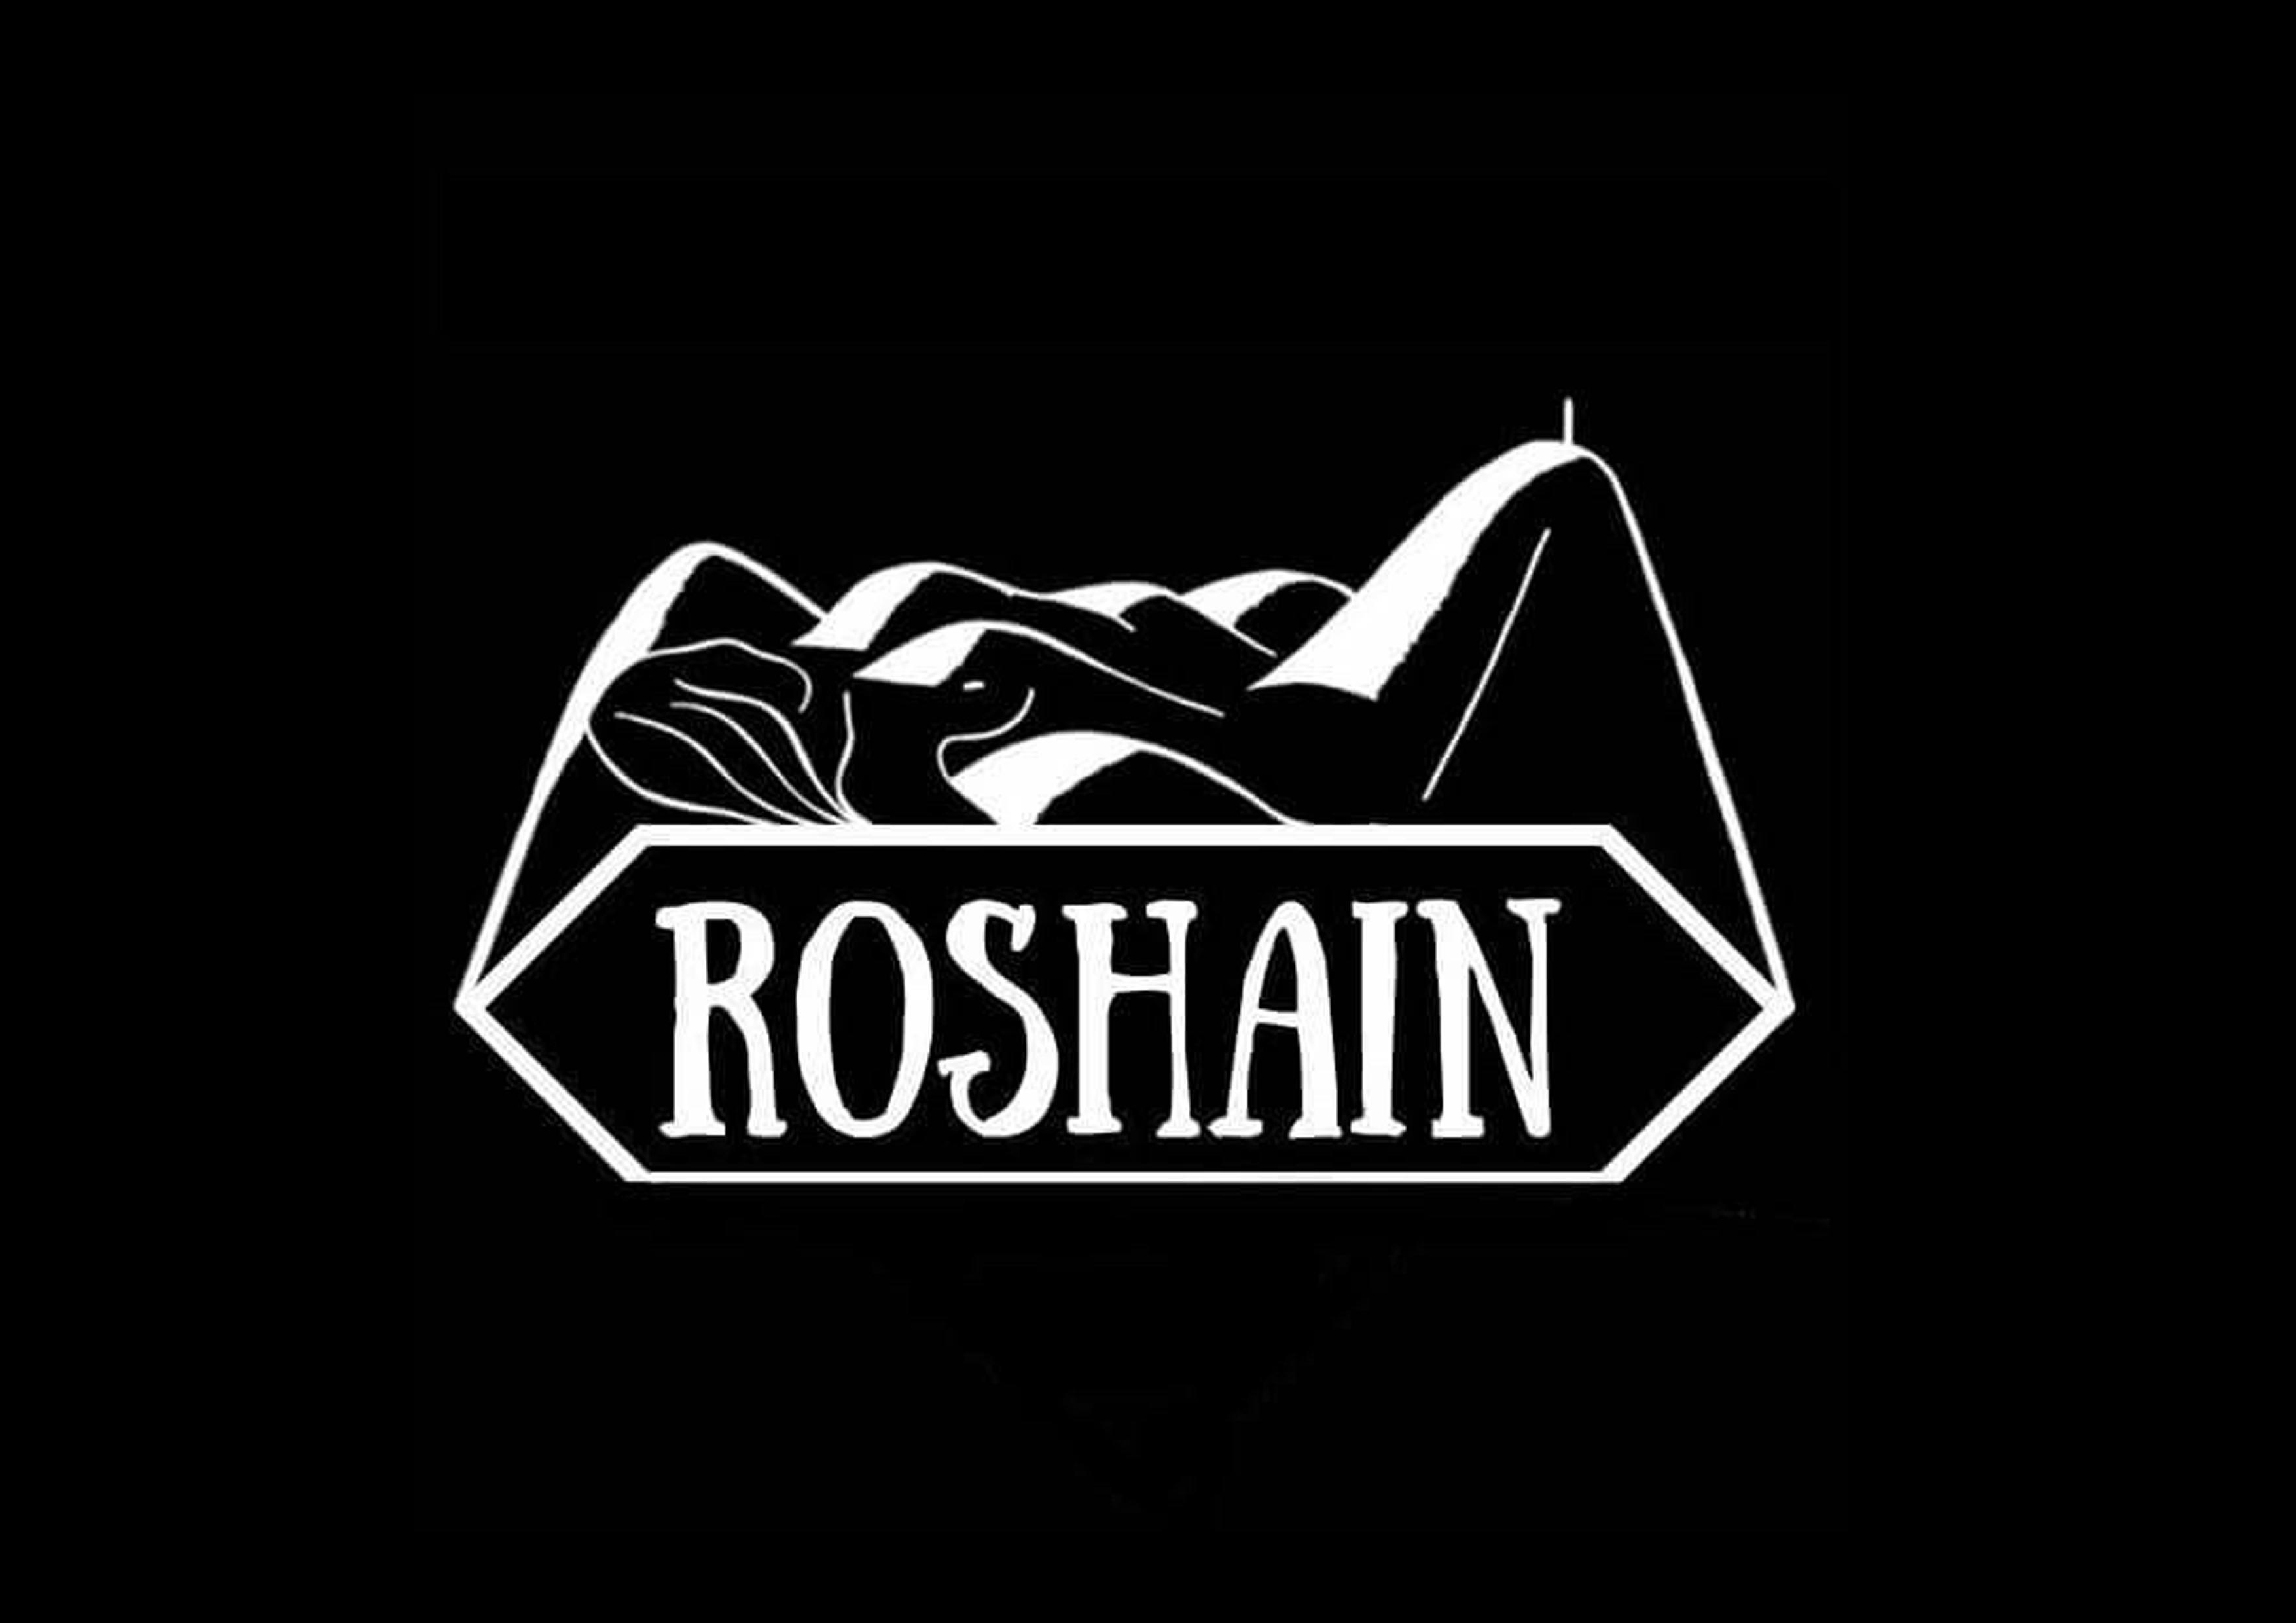 Roshain